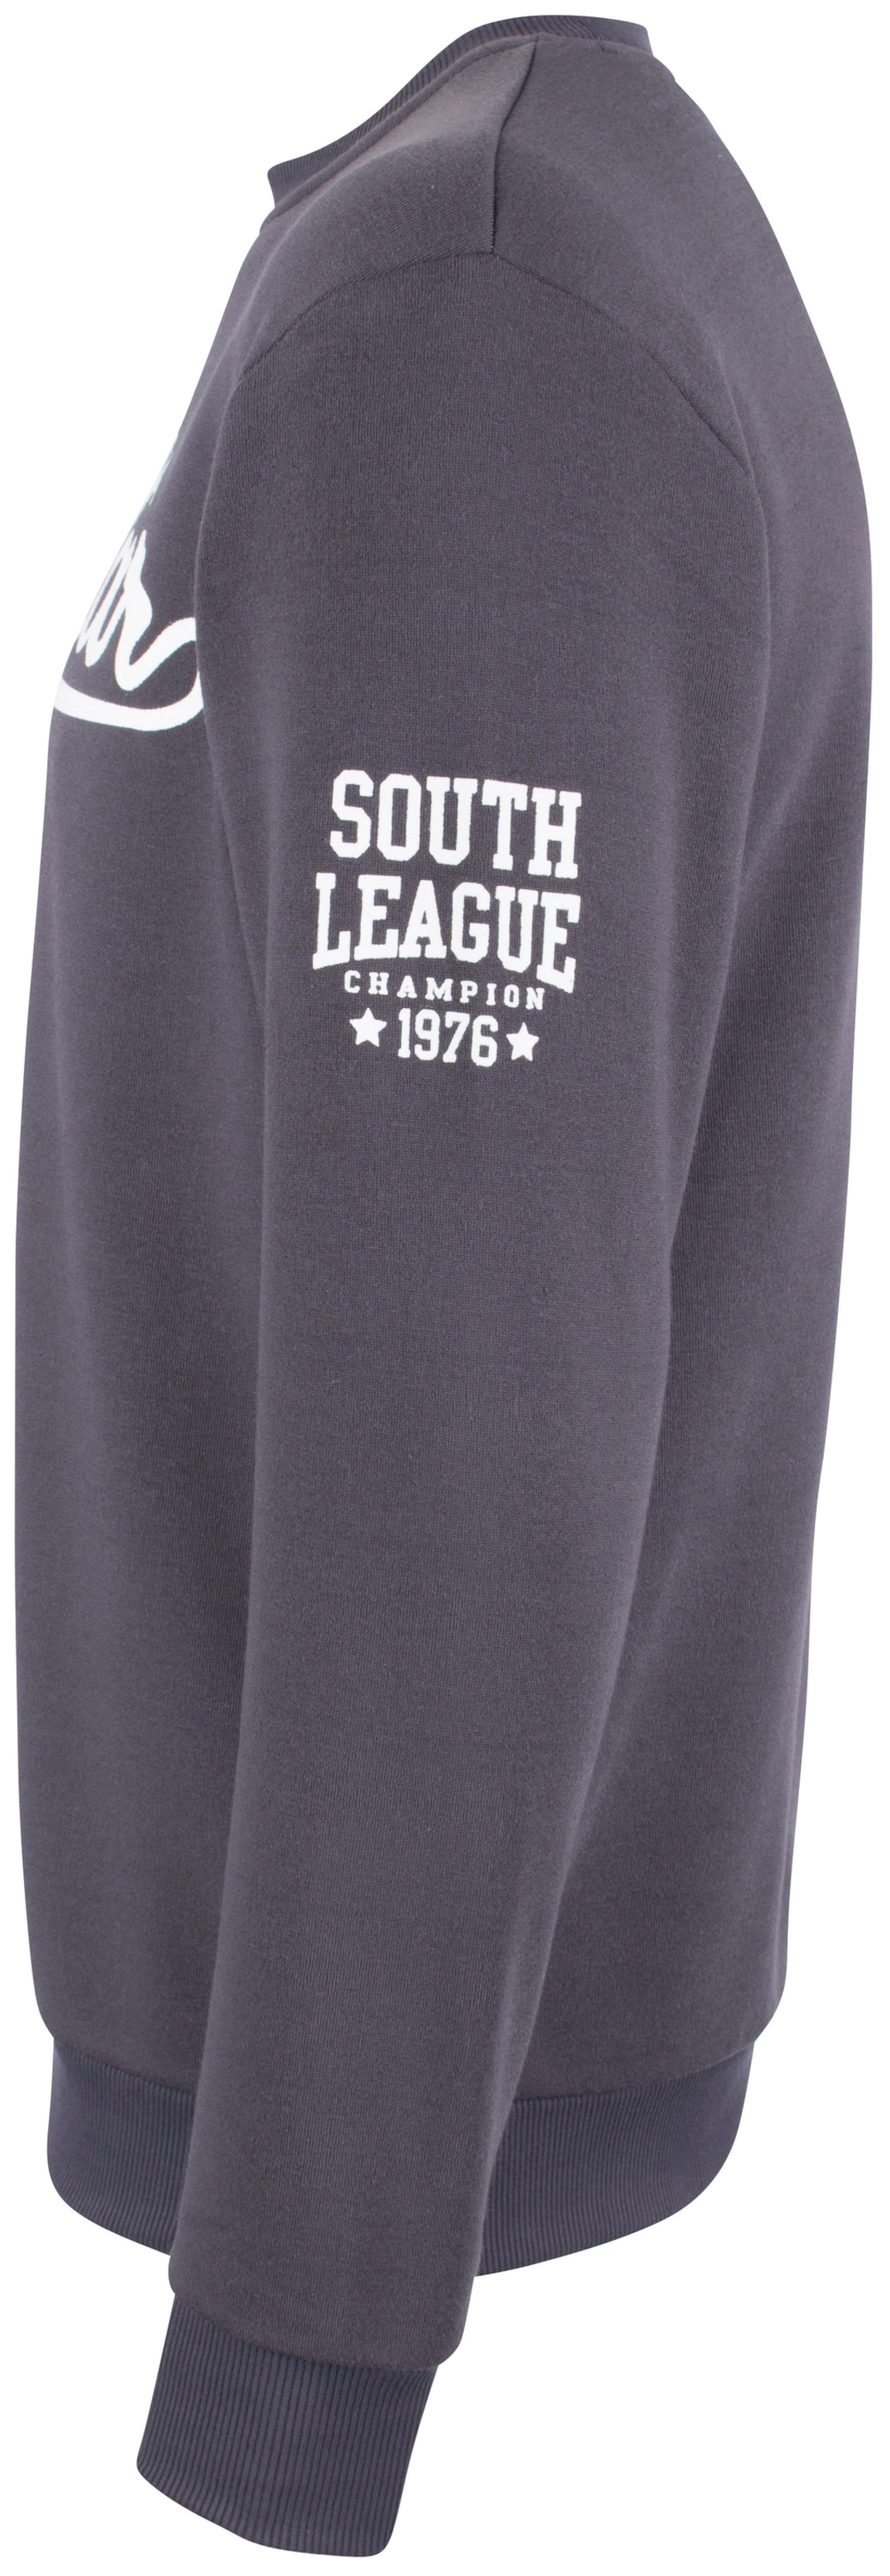 FoncéBlanc Sweat shirt Gris Soulstar En lTKJFc1